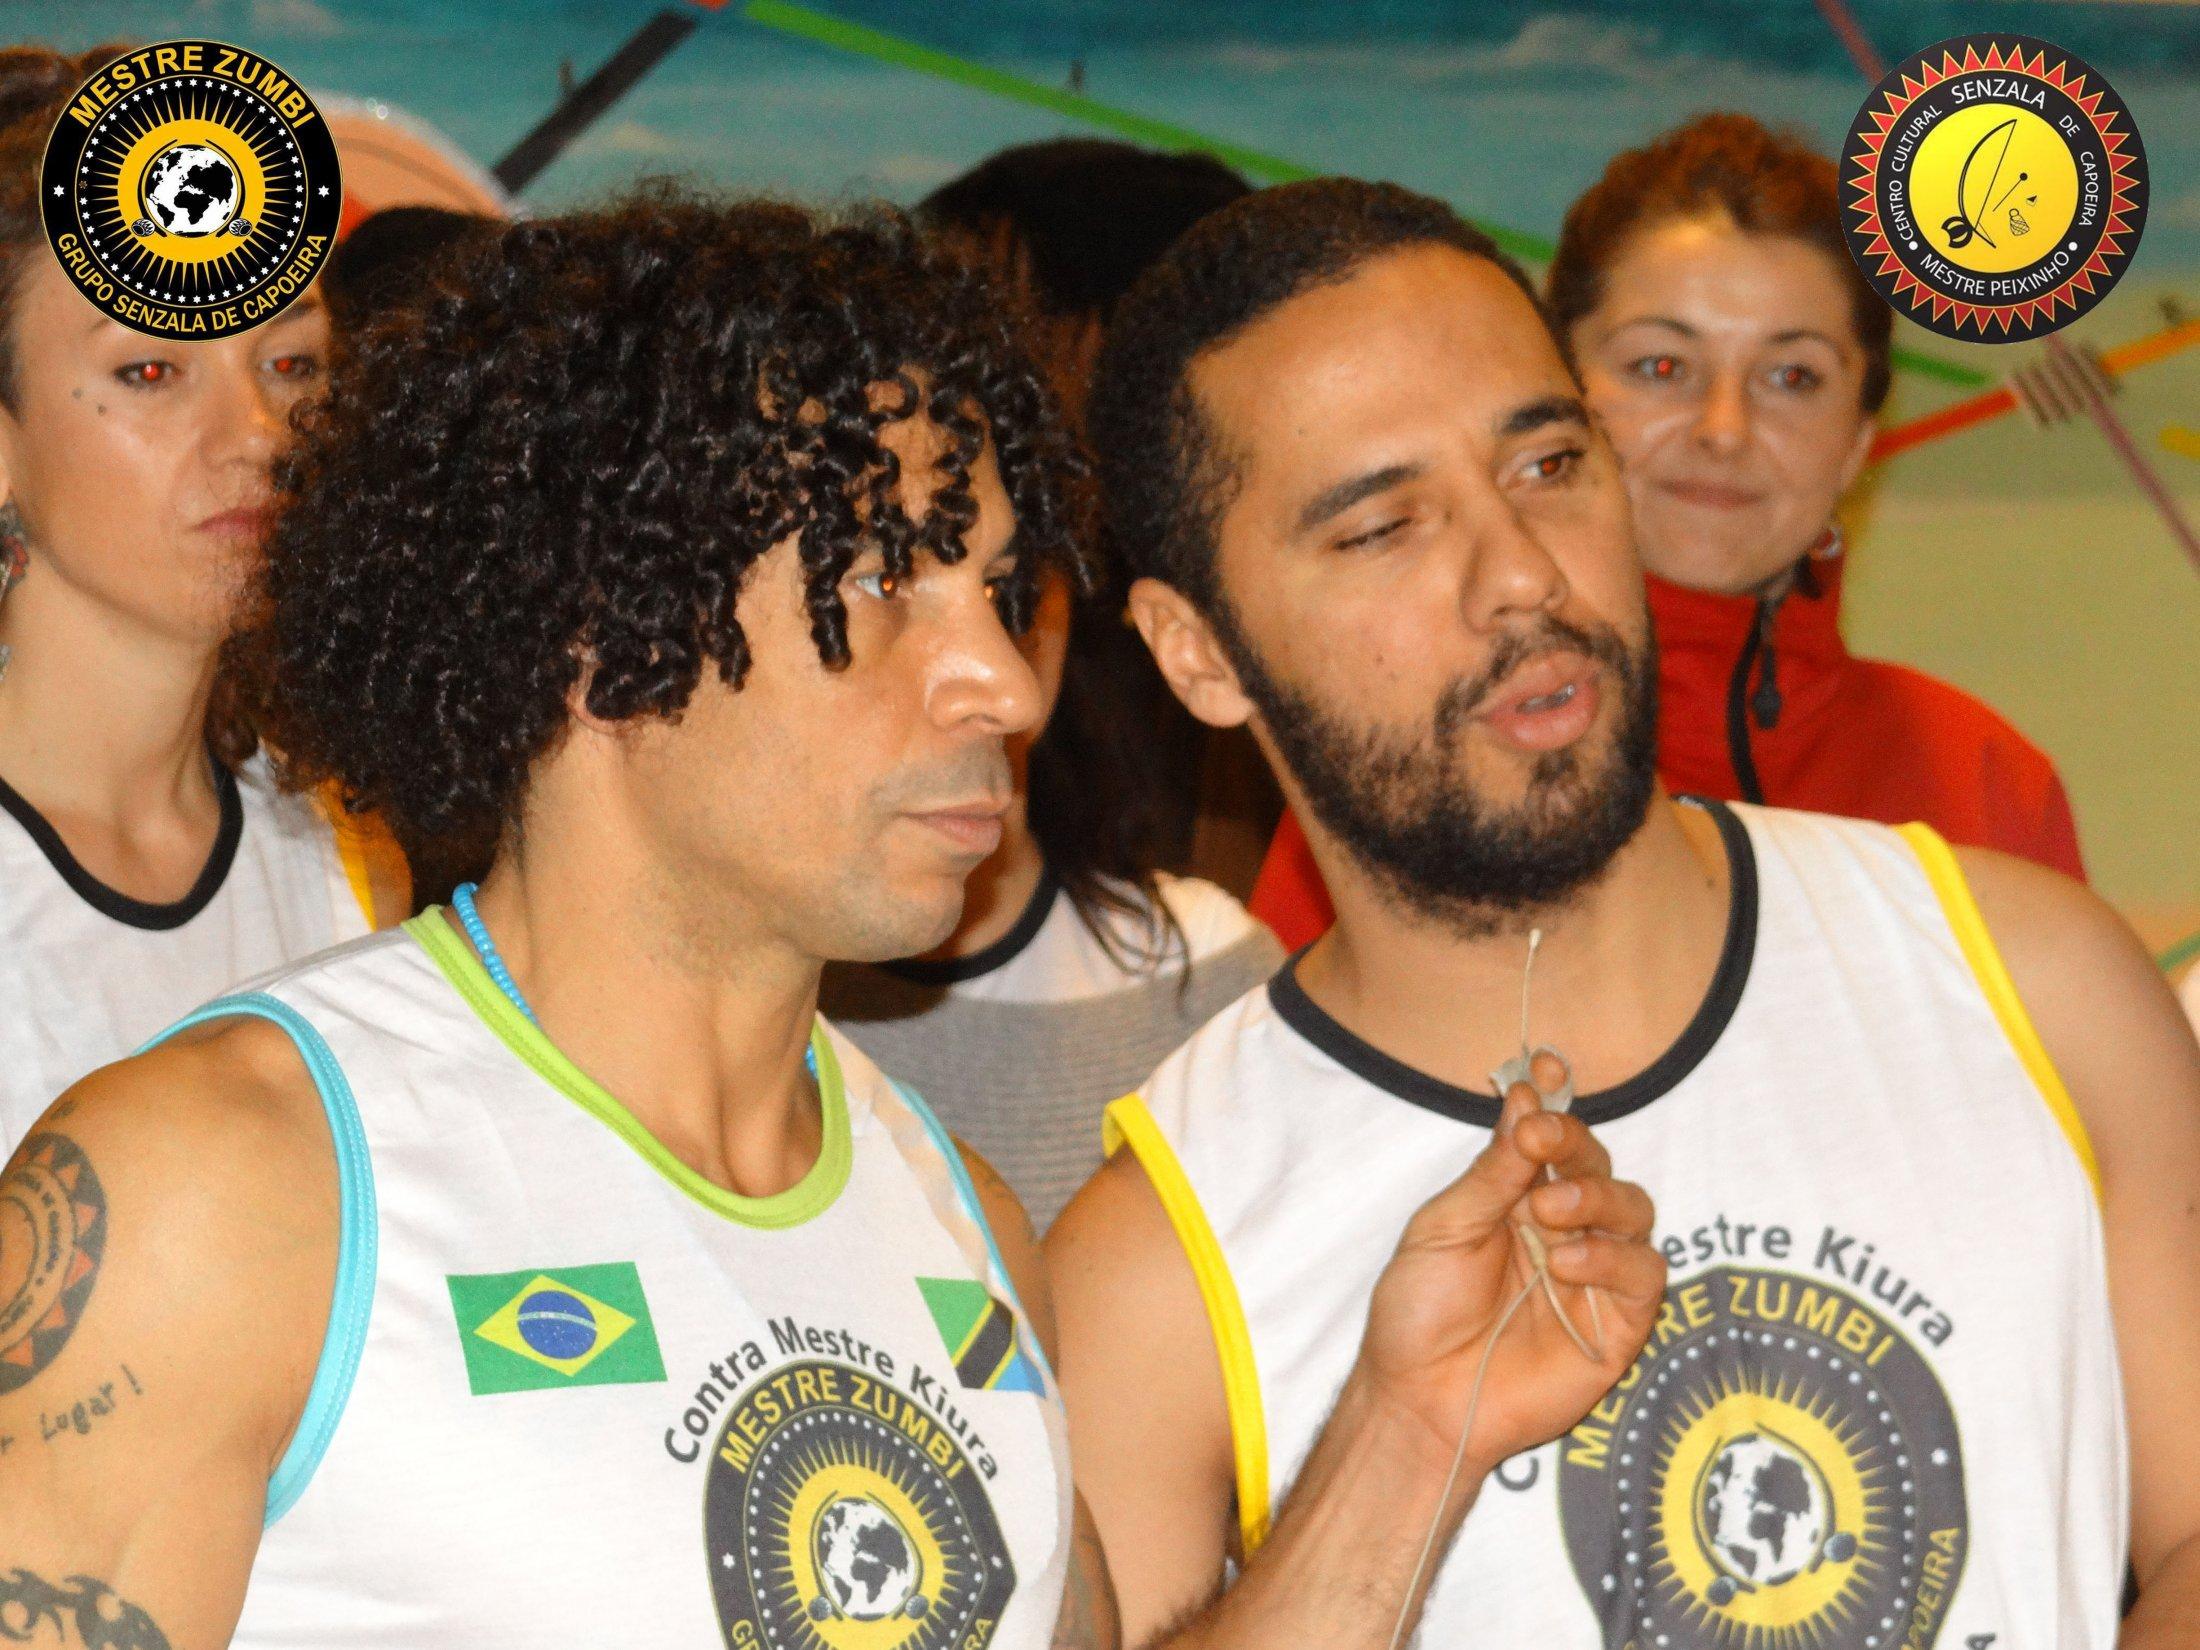 2013-12-14 - Capoeira 115